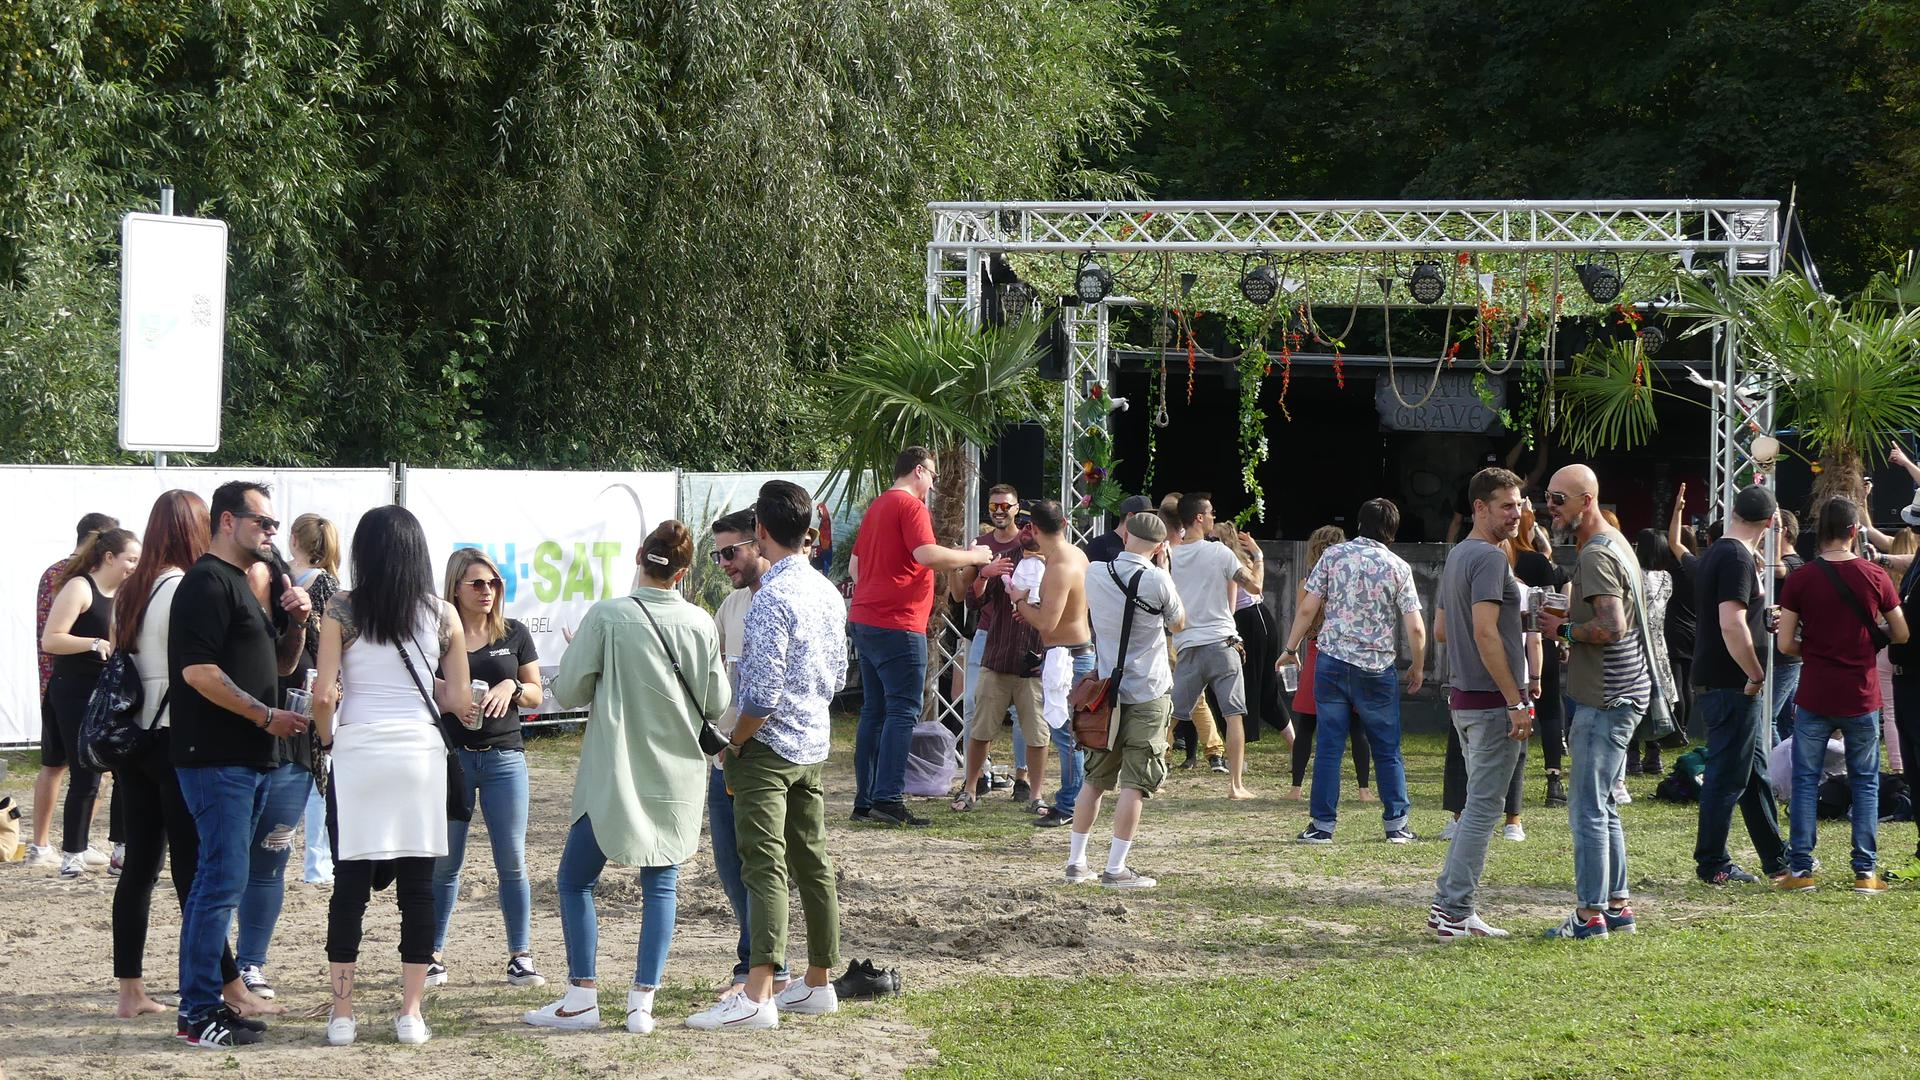 Besucher beim Pirate Open-Air-Festival